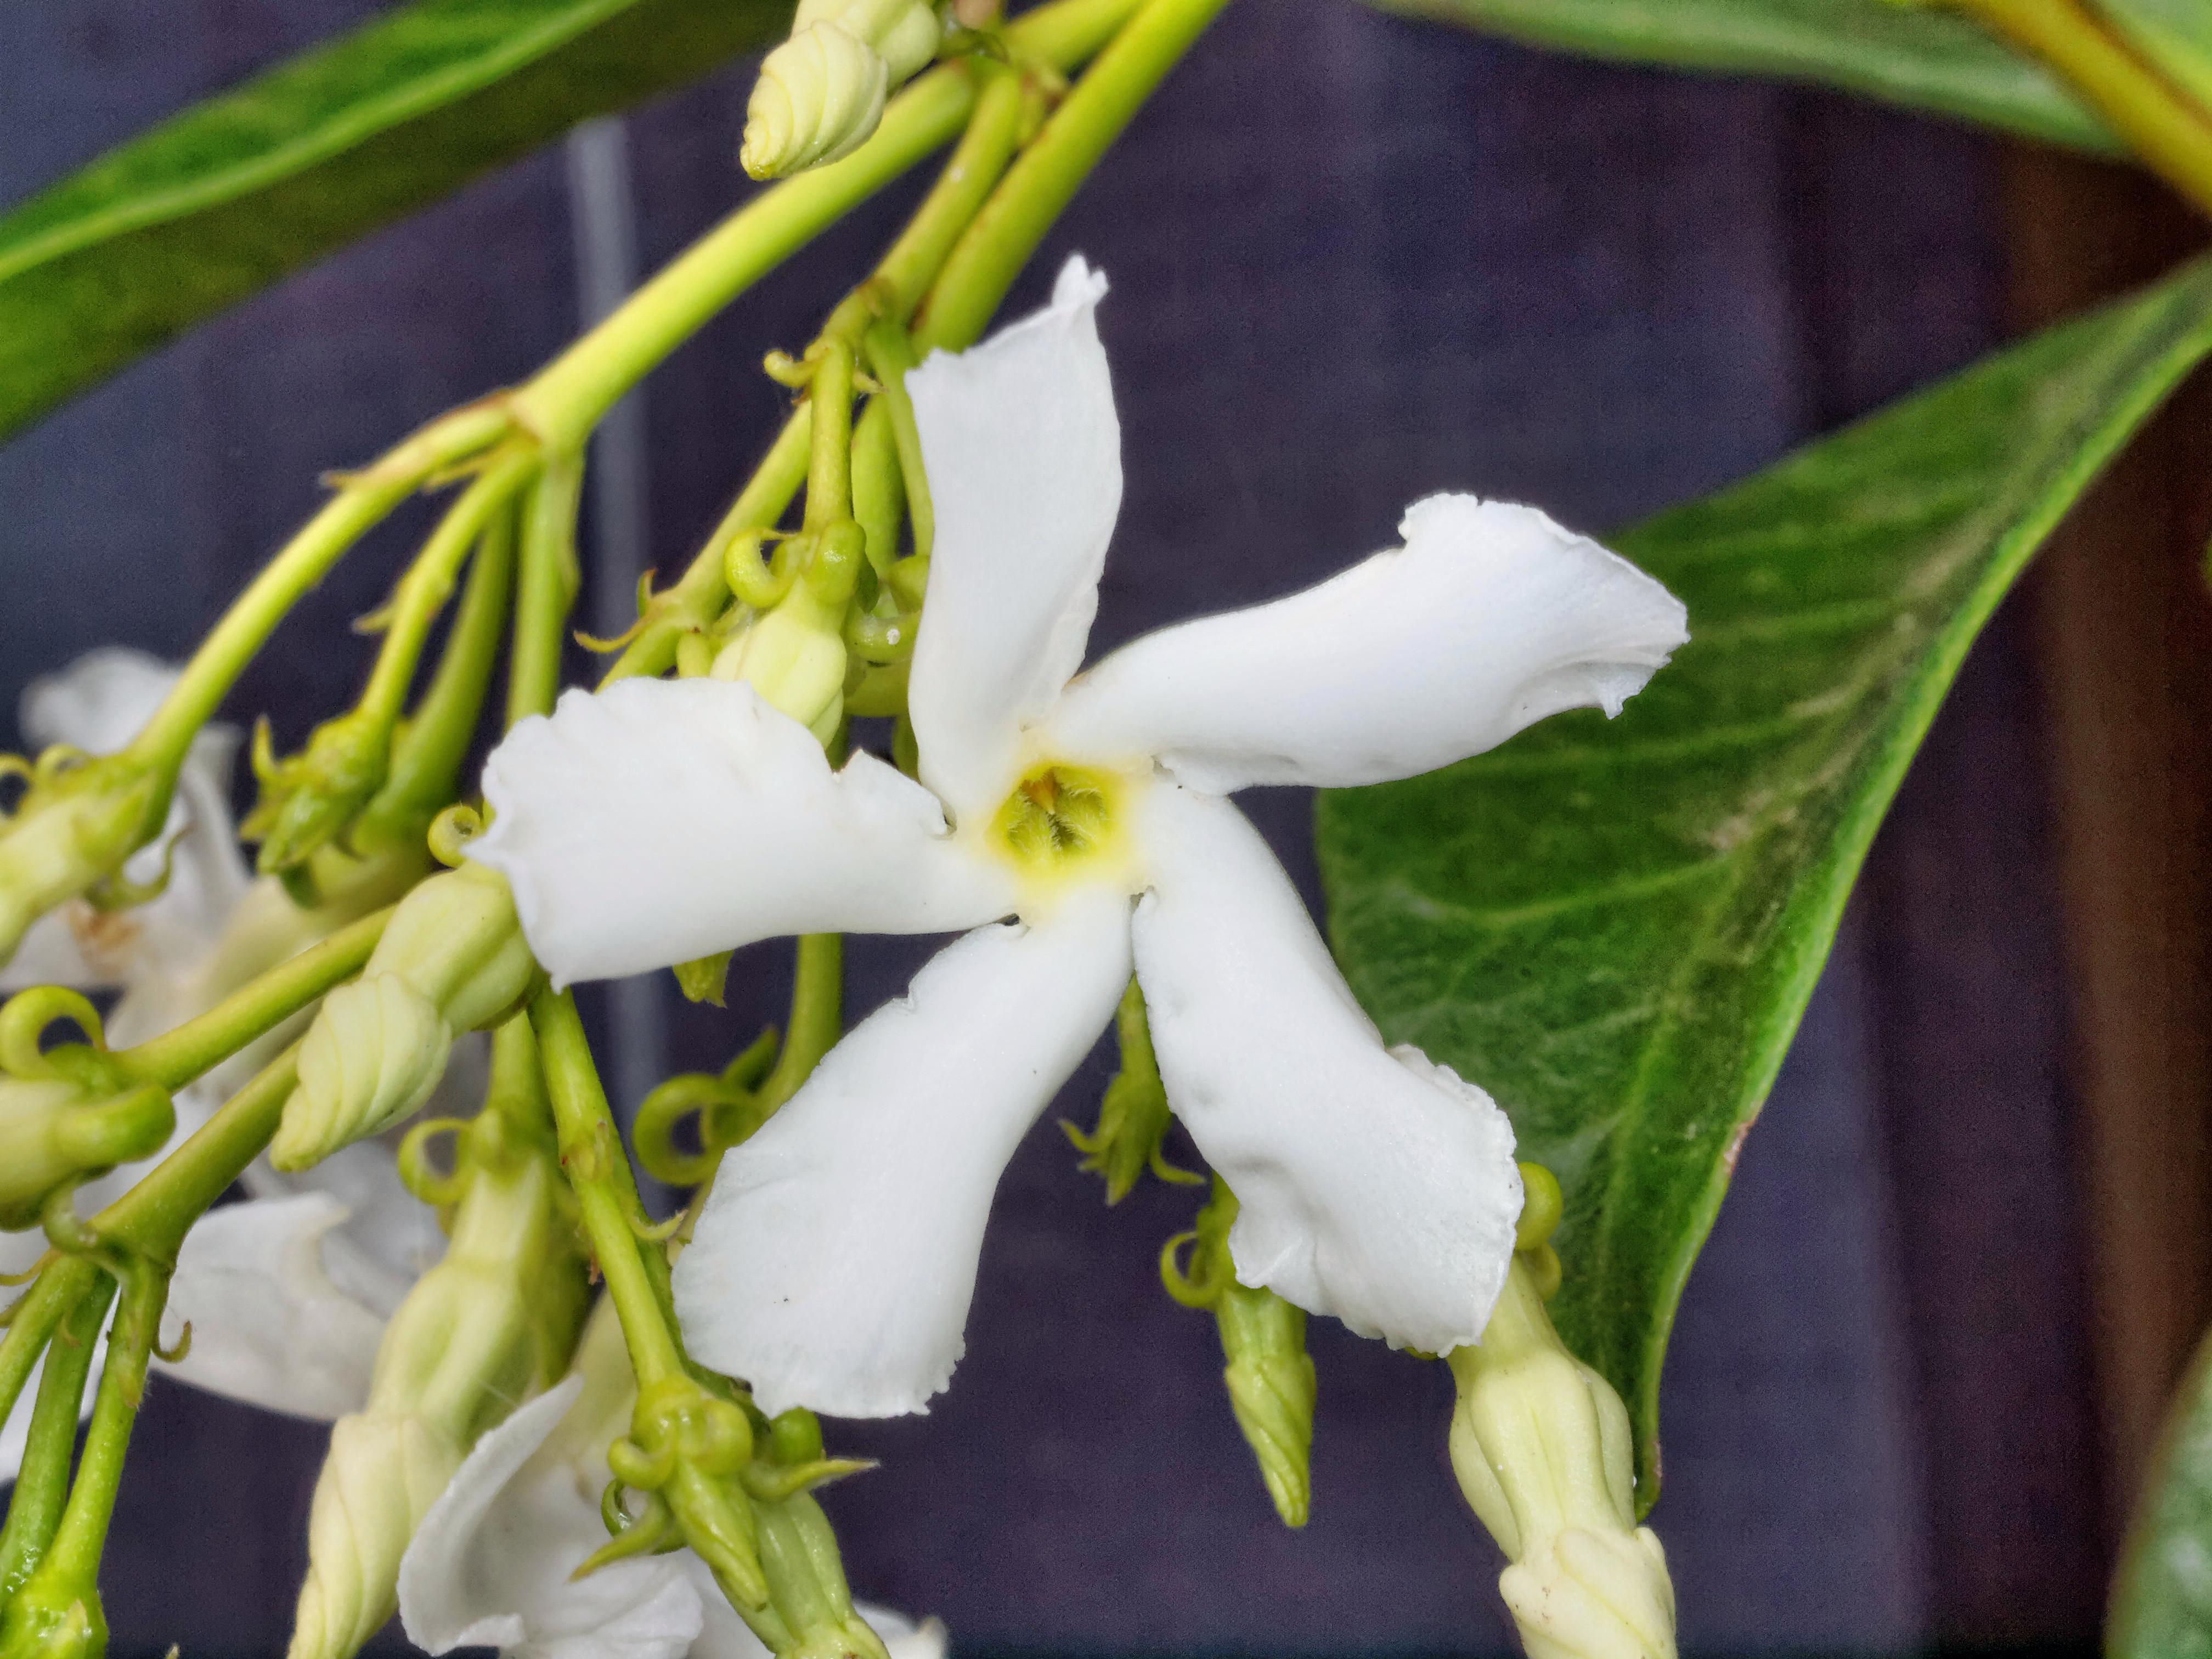 Trachelospermum-jasminoides-3.jpeg